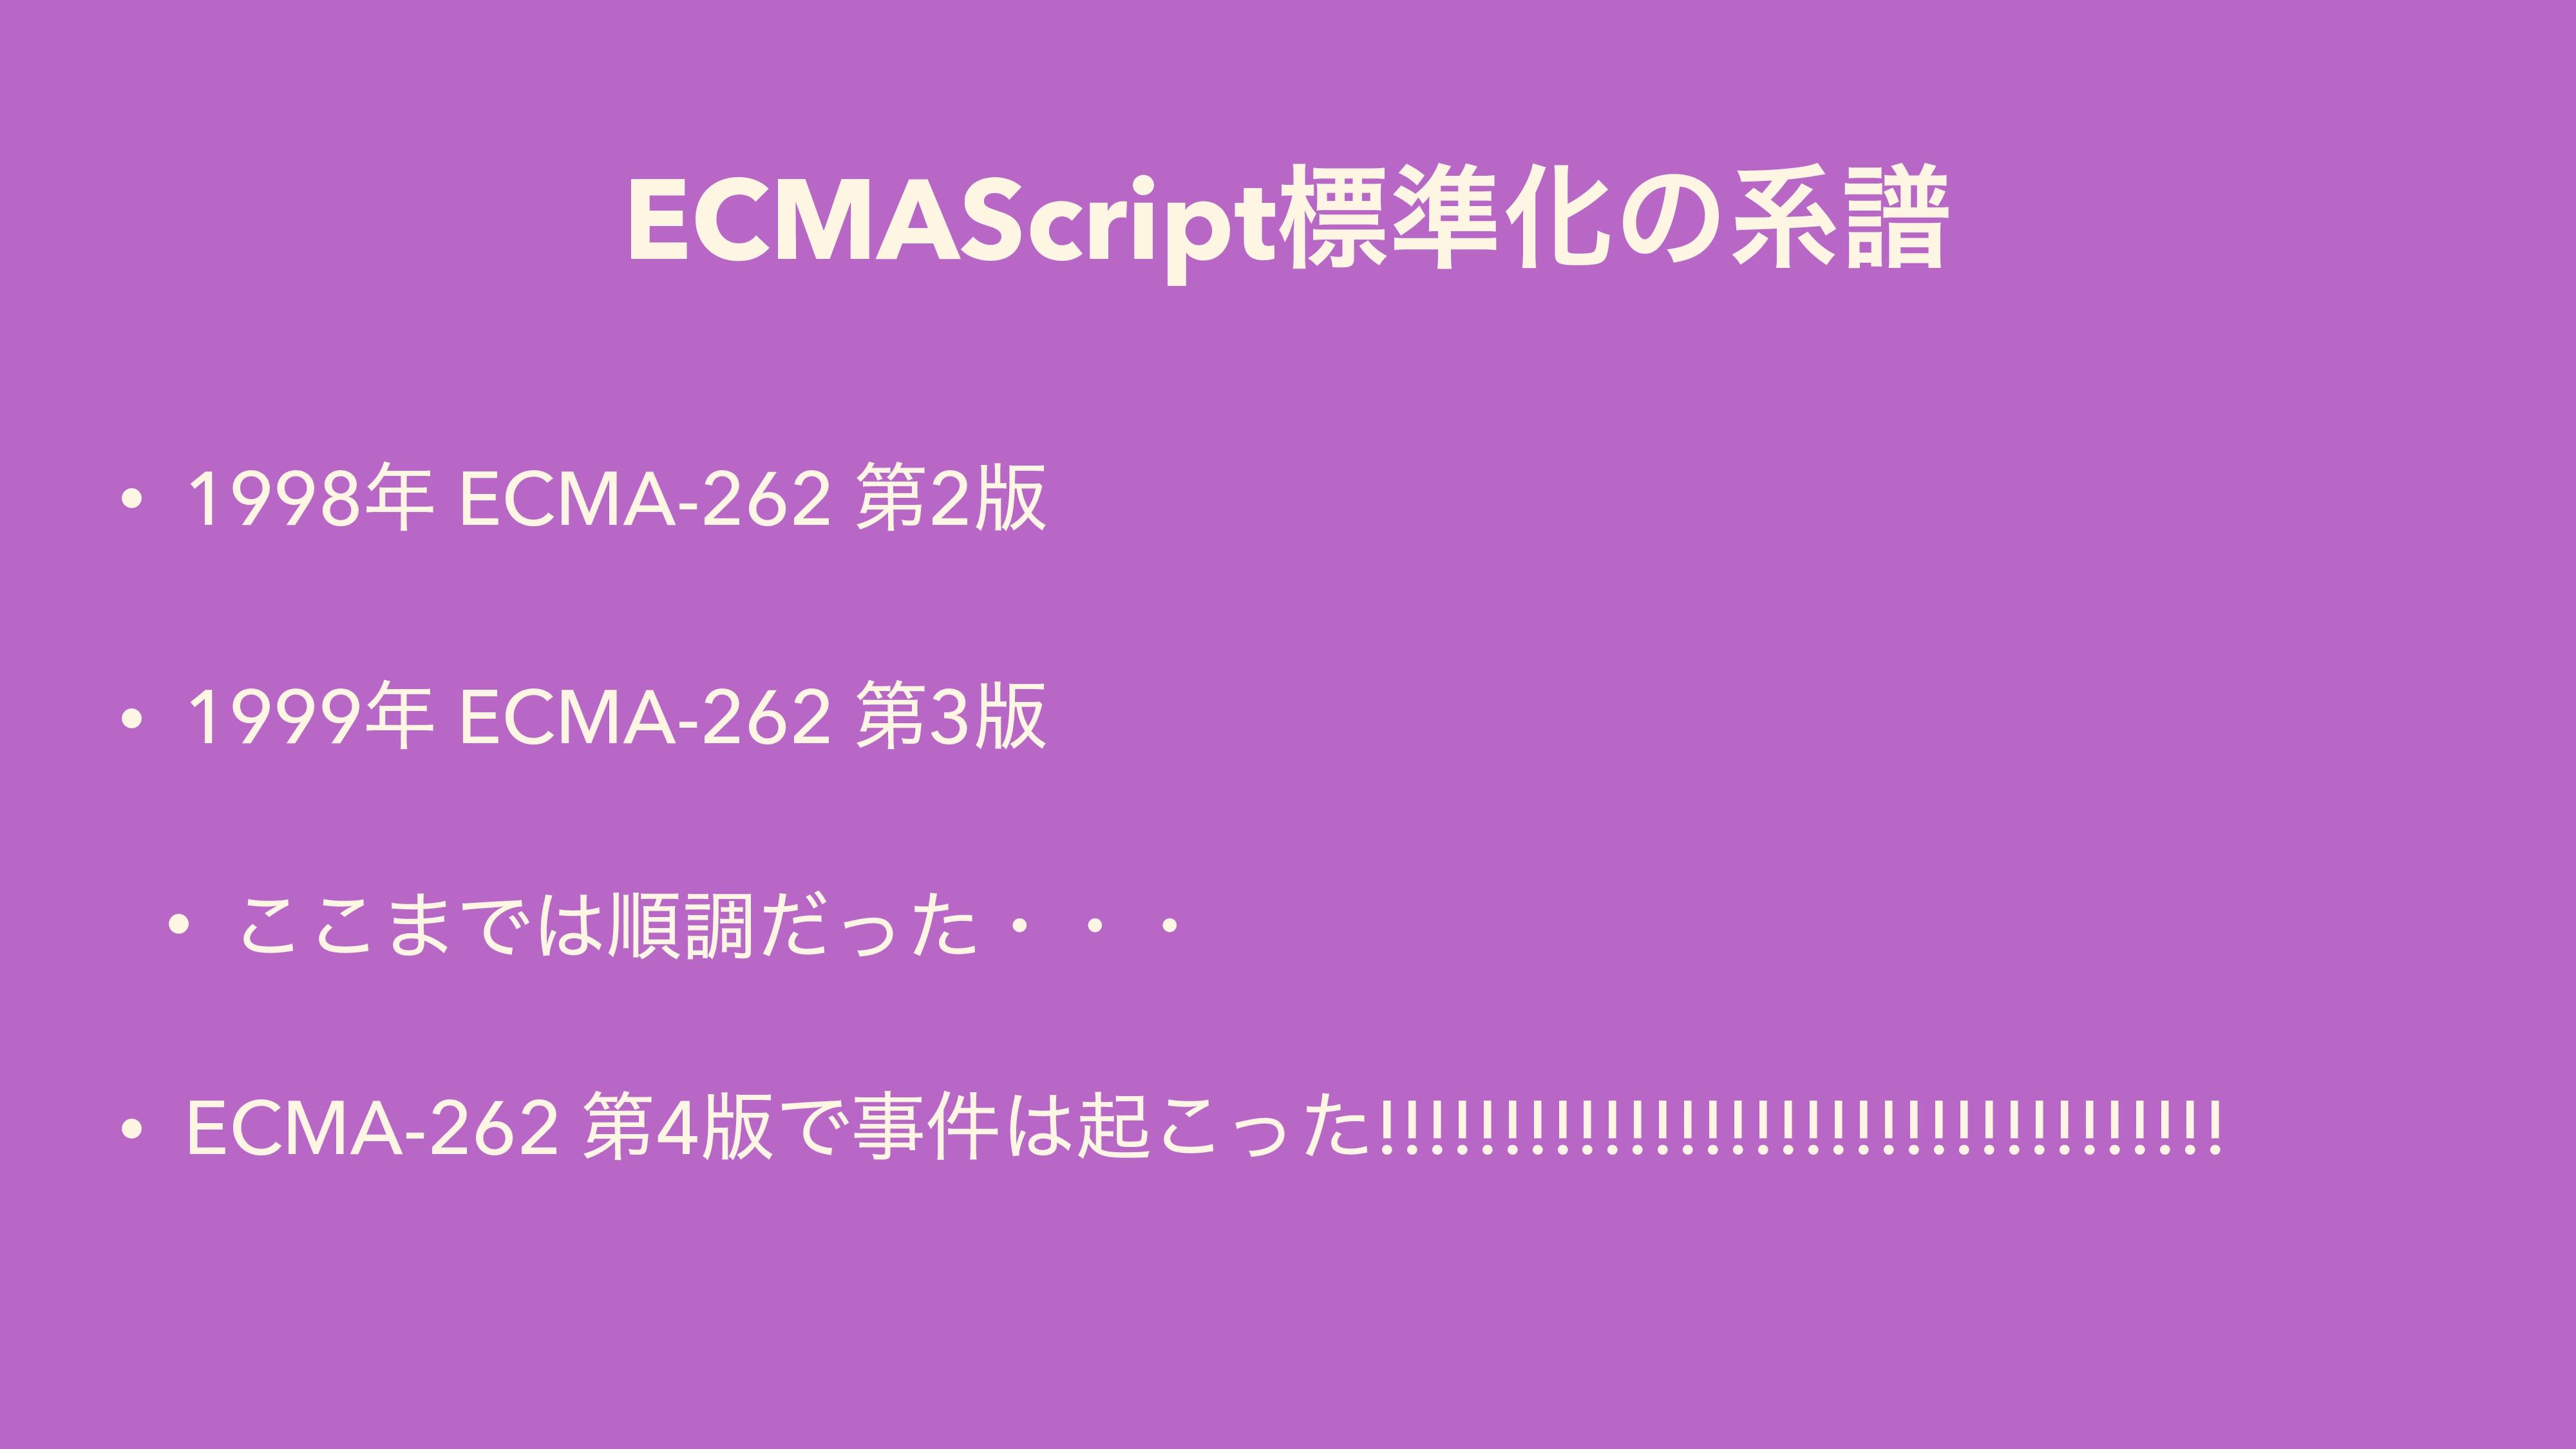 ECMAScriptඪ४Խͷܥේ • 1998 ECMA-262 ୈ2൛ • 1999 E...